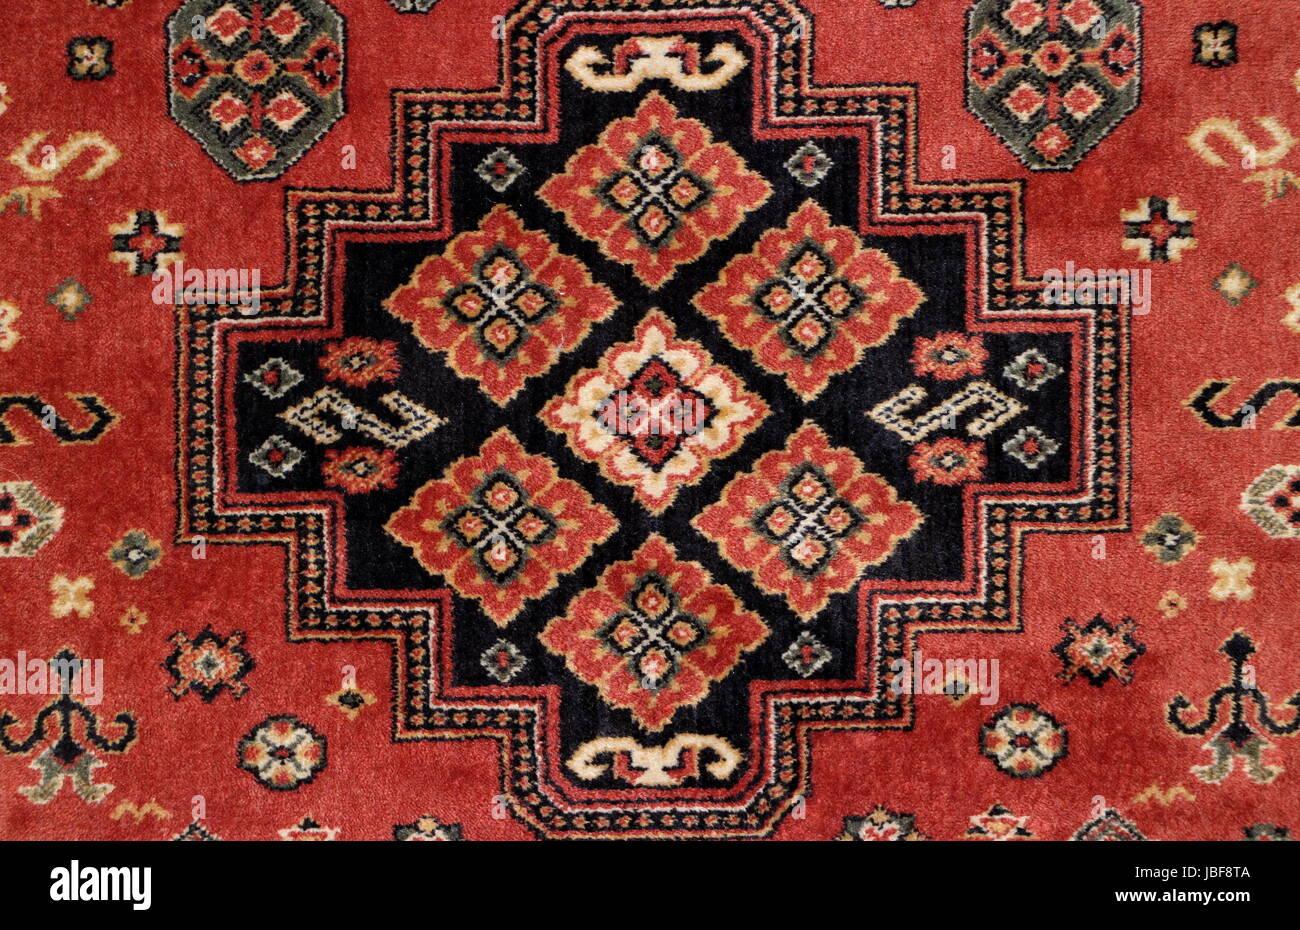 Geometrische Muster Alter Perser Teppich Closeup Stockfoto Bild